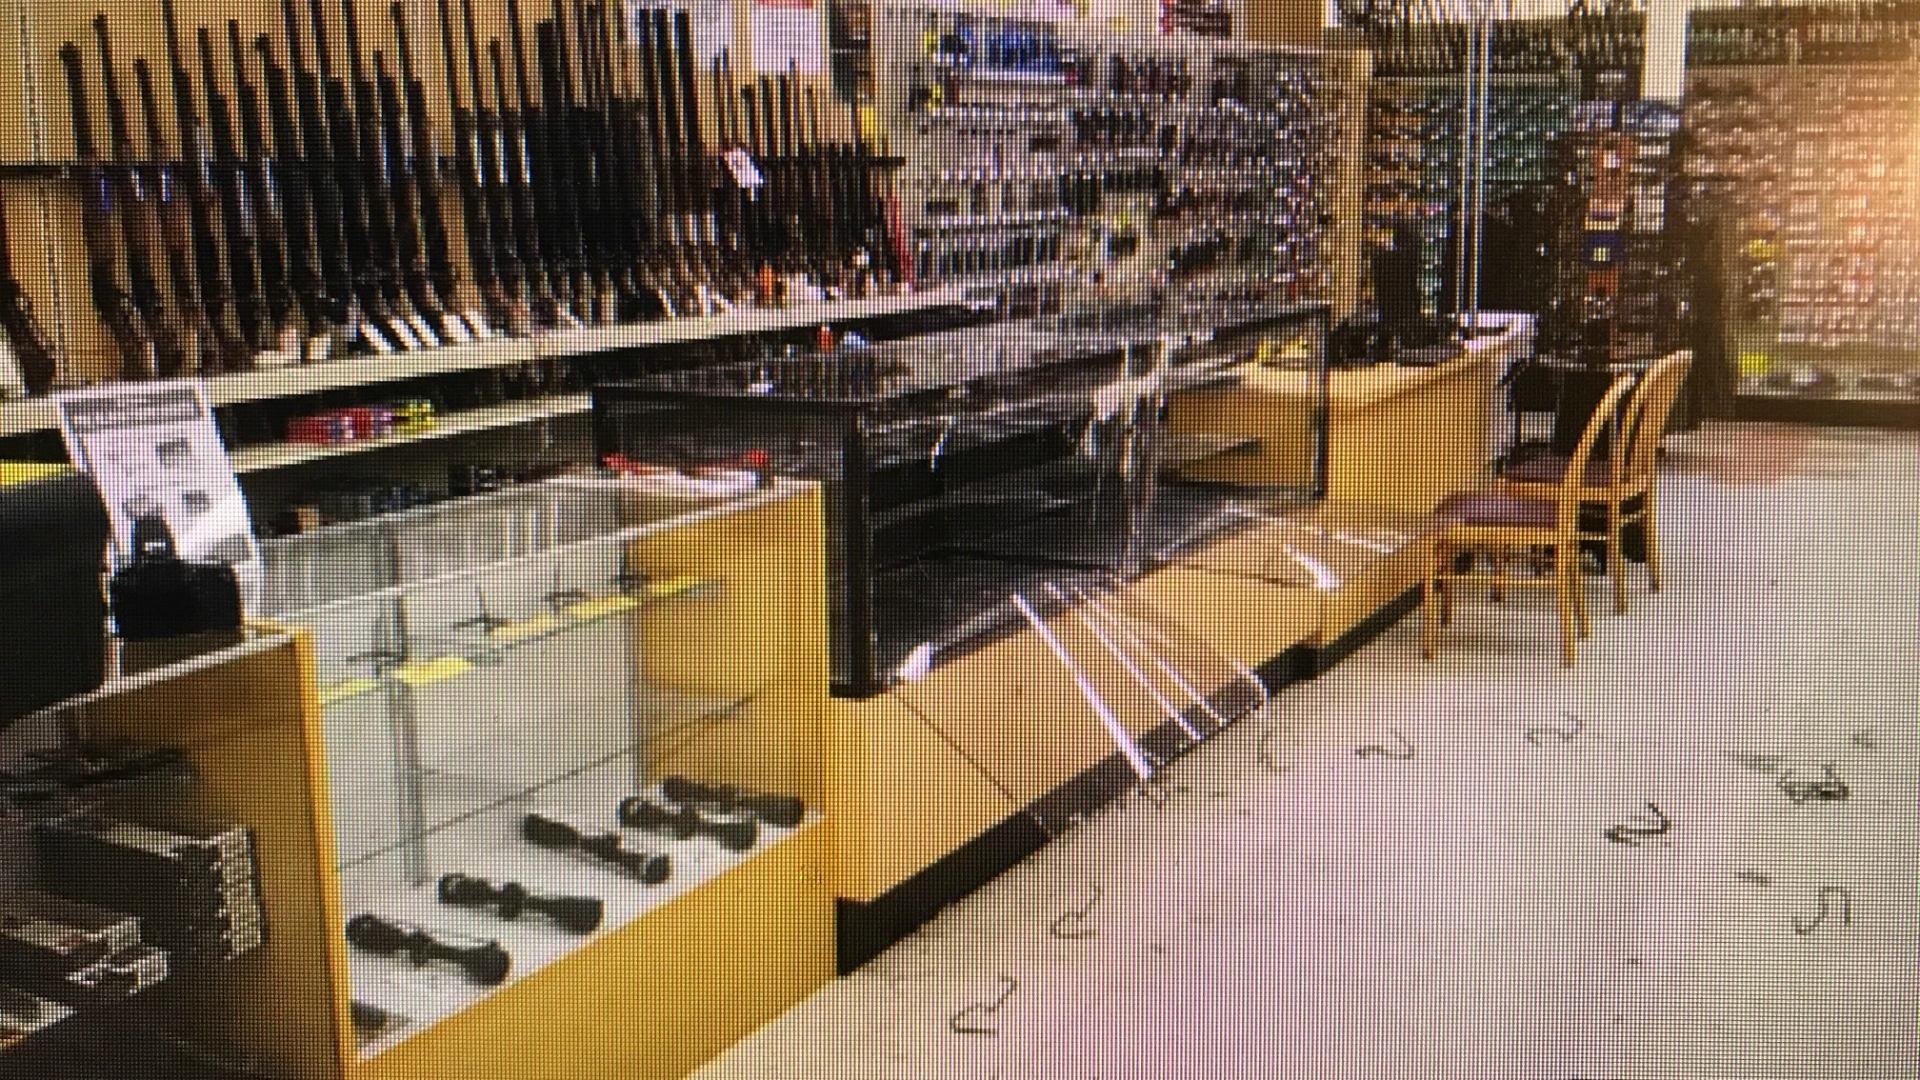 cedar springs family farm and home gun theft